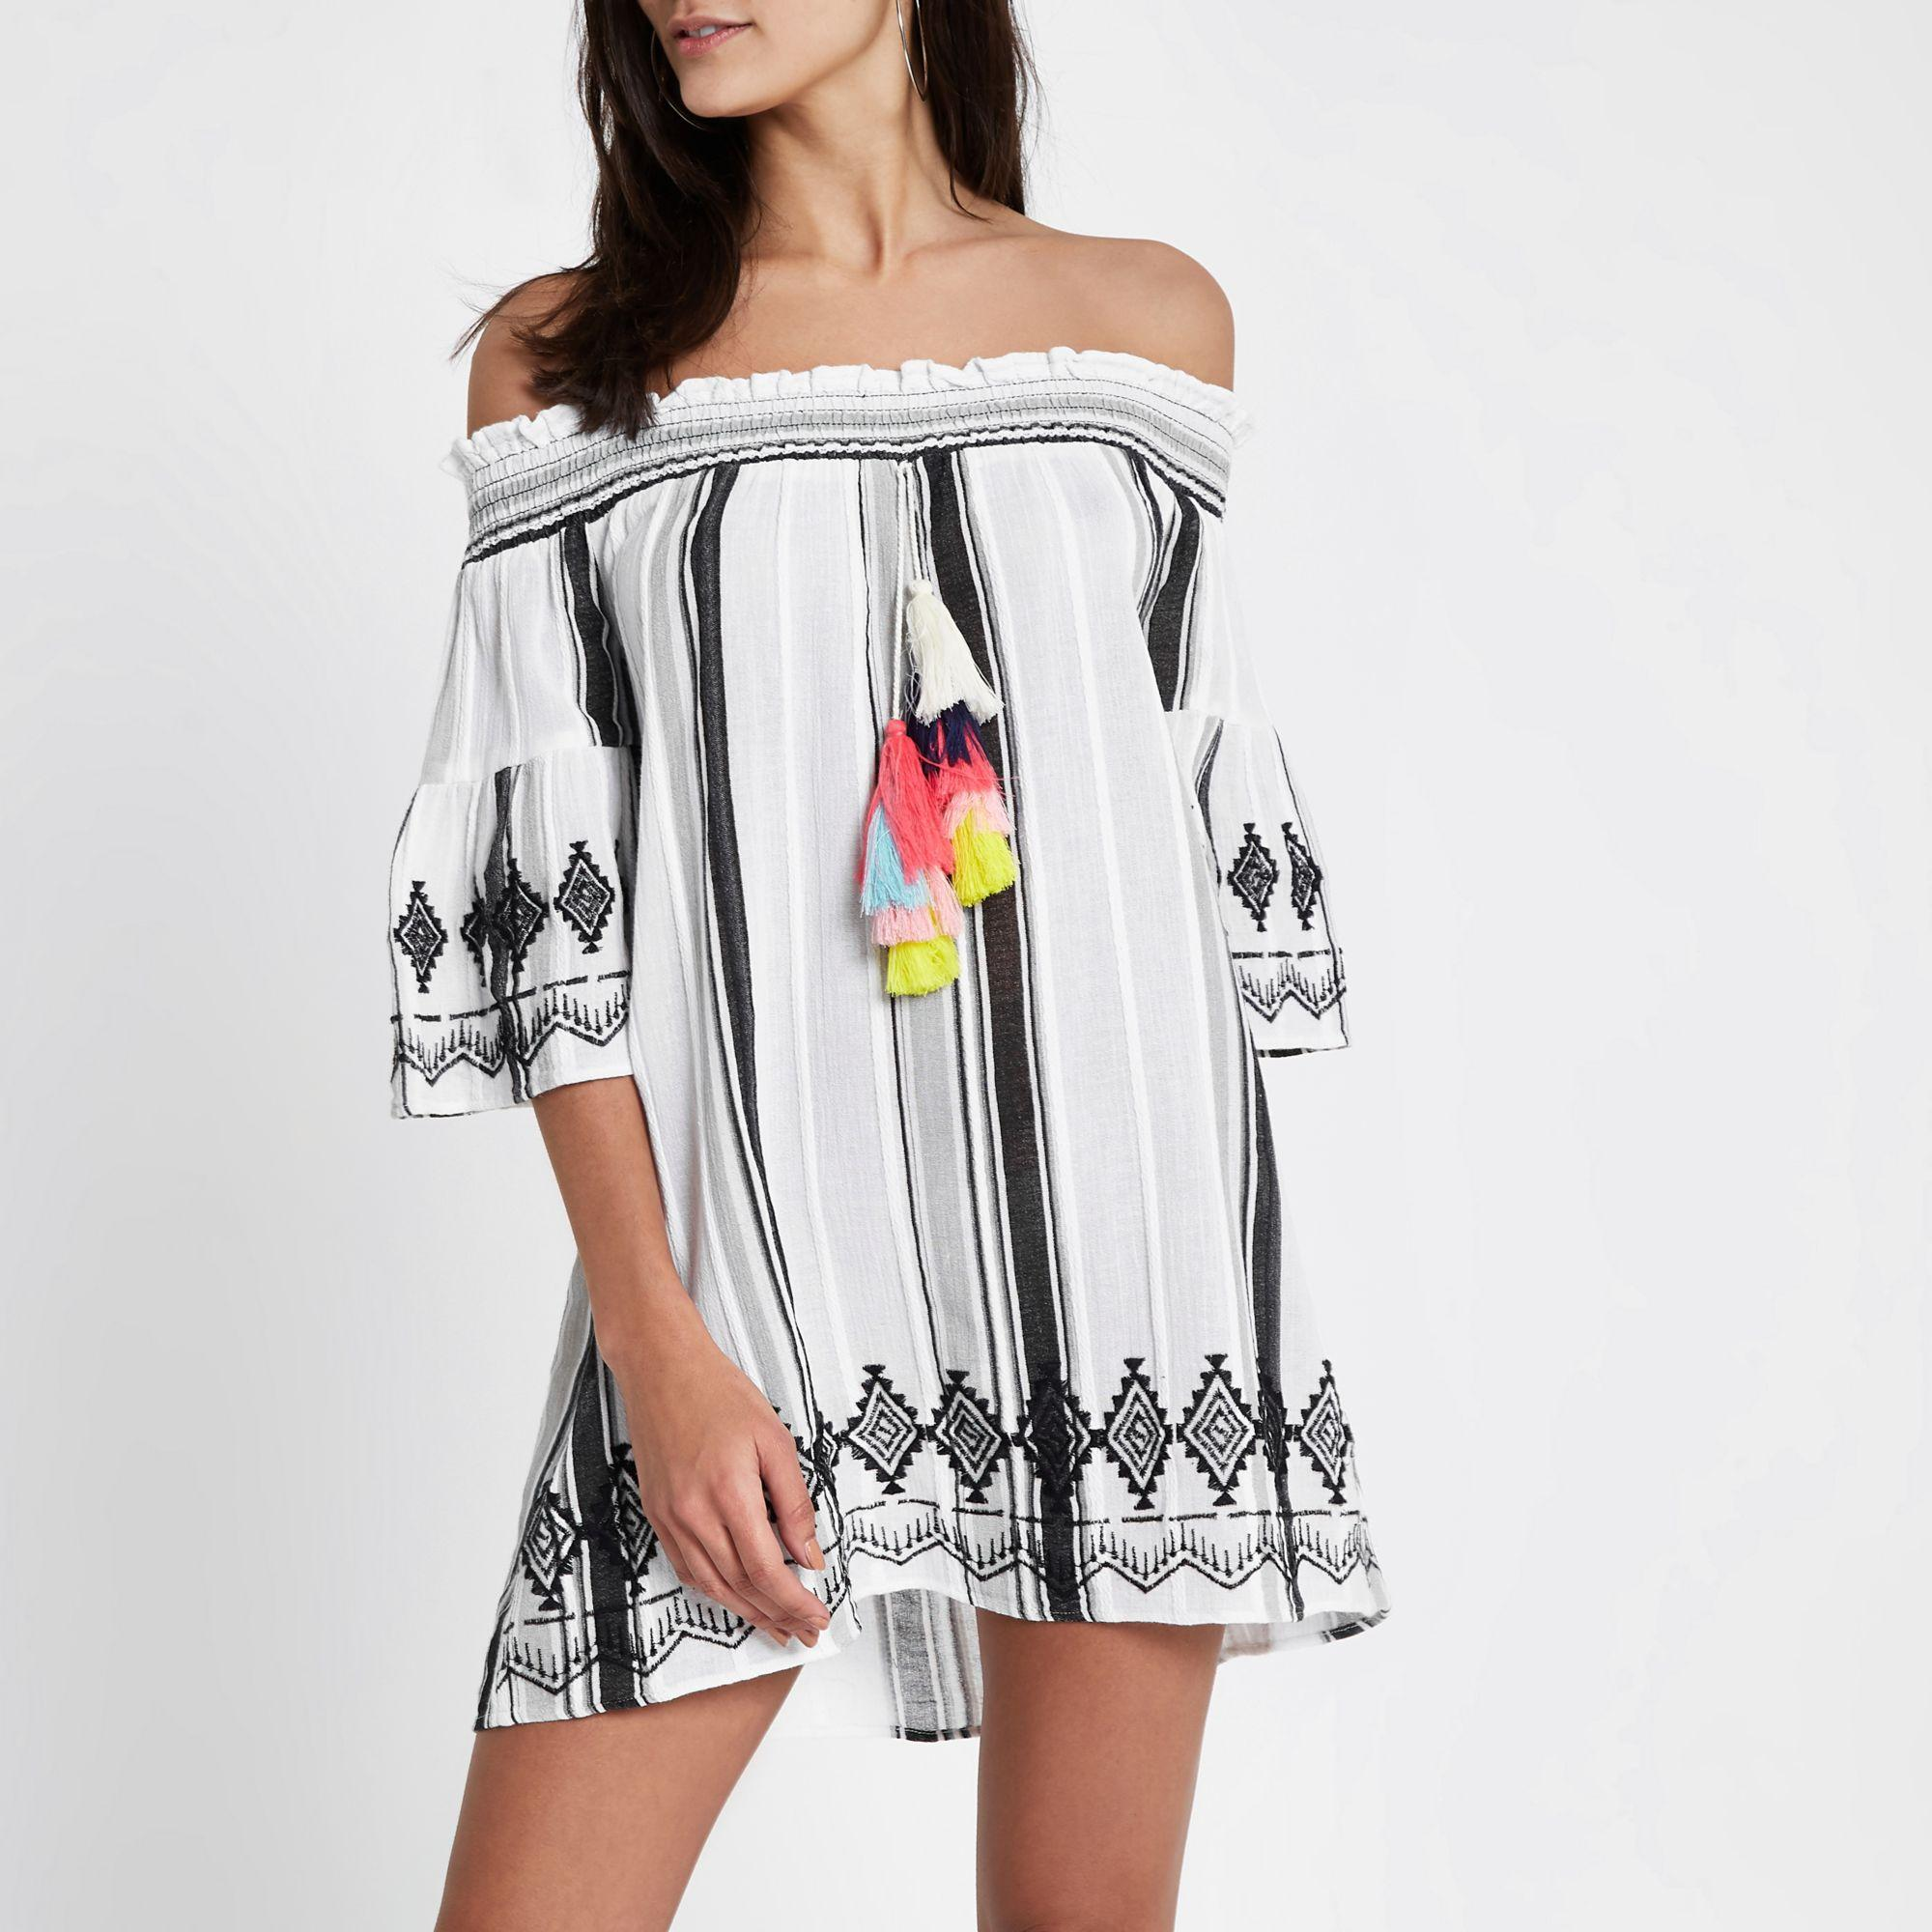 982eda9443 River Island Stripe Tassel Bardot Beach Dress in White - Lyst